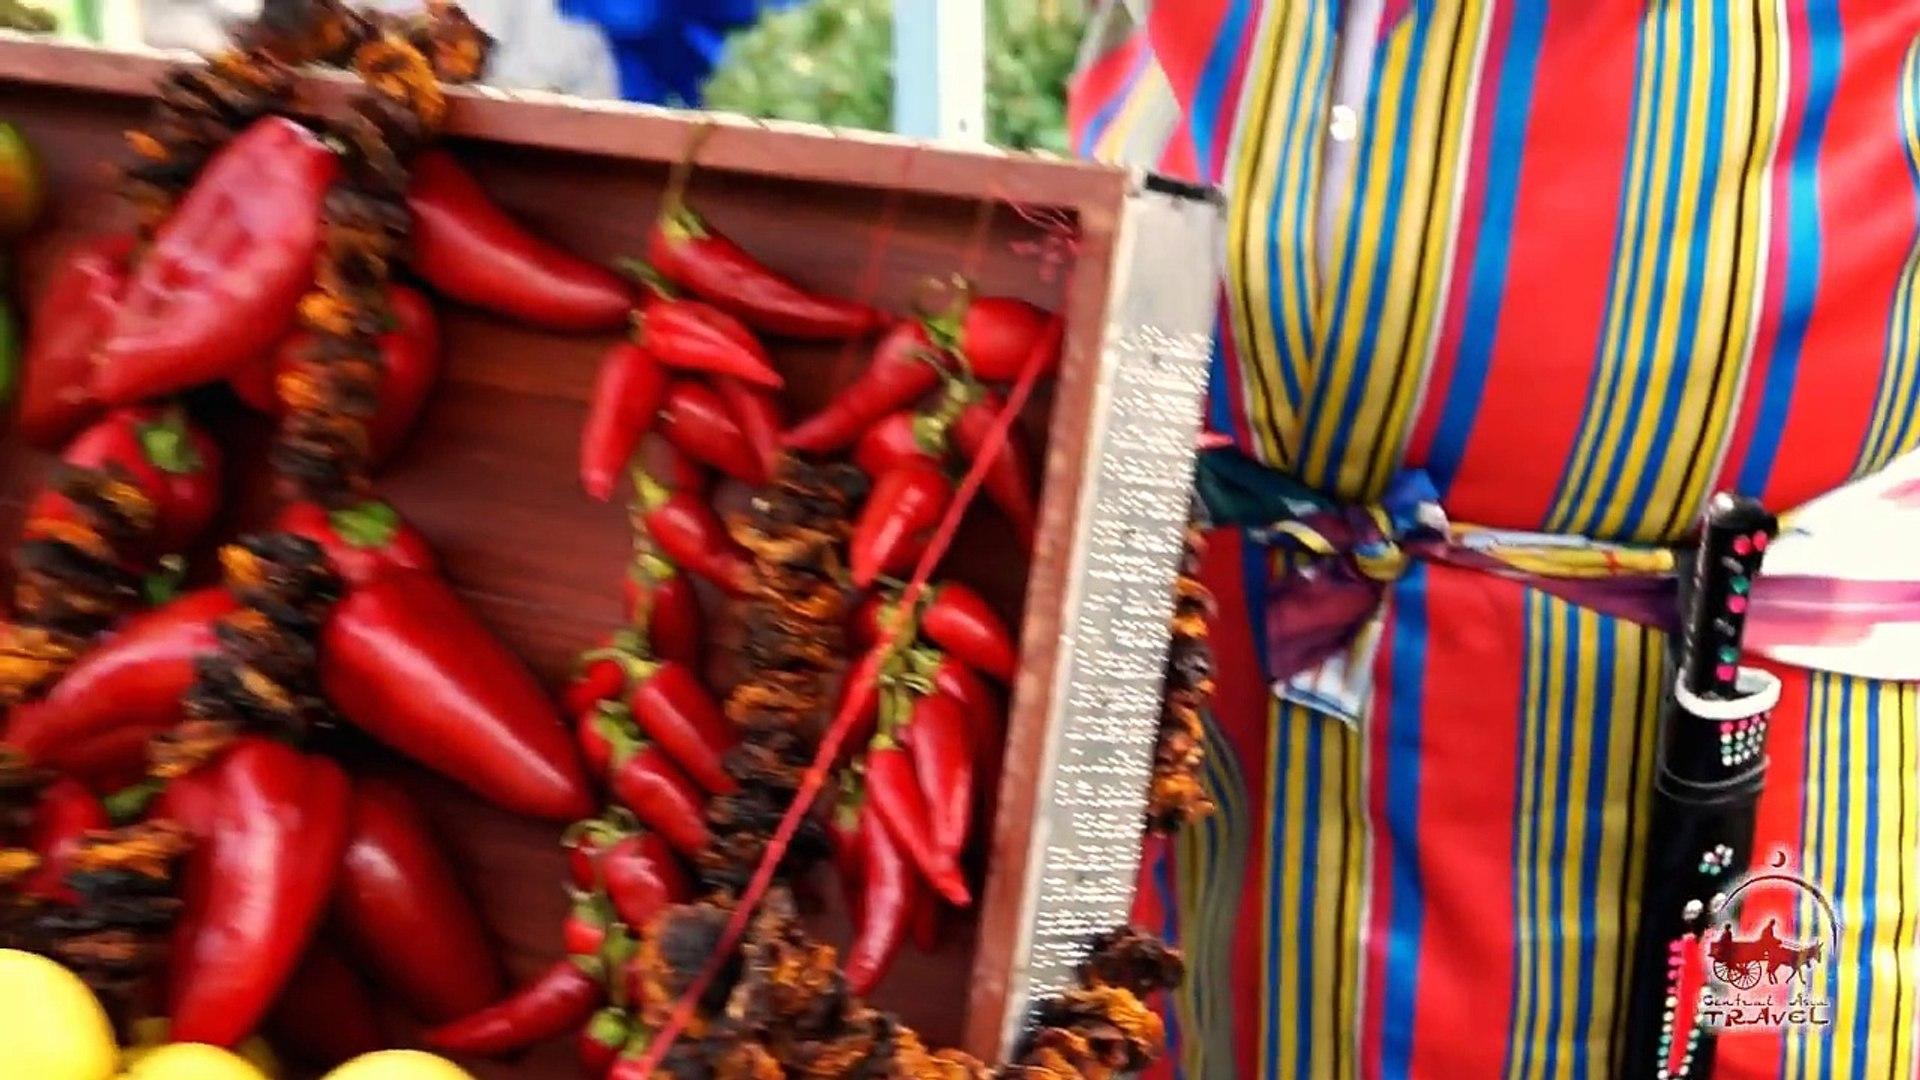 Узбекские фрукты и овощи. Базары Узбекистана. Дары Узбекистана.